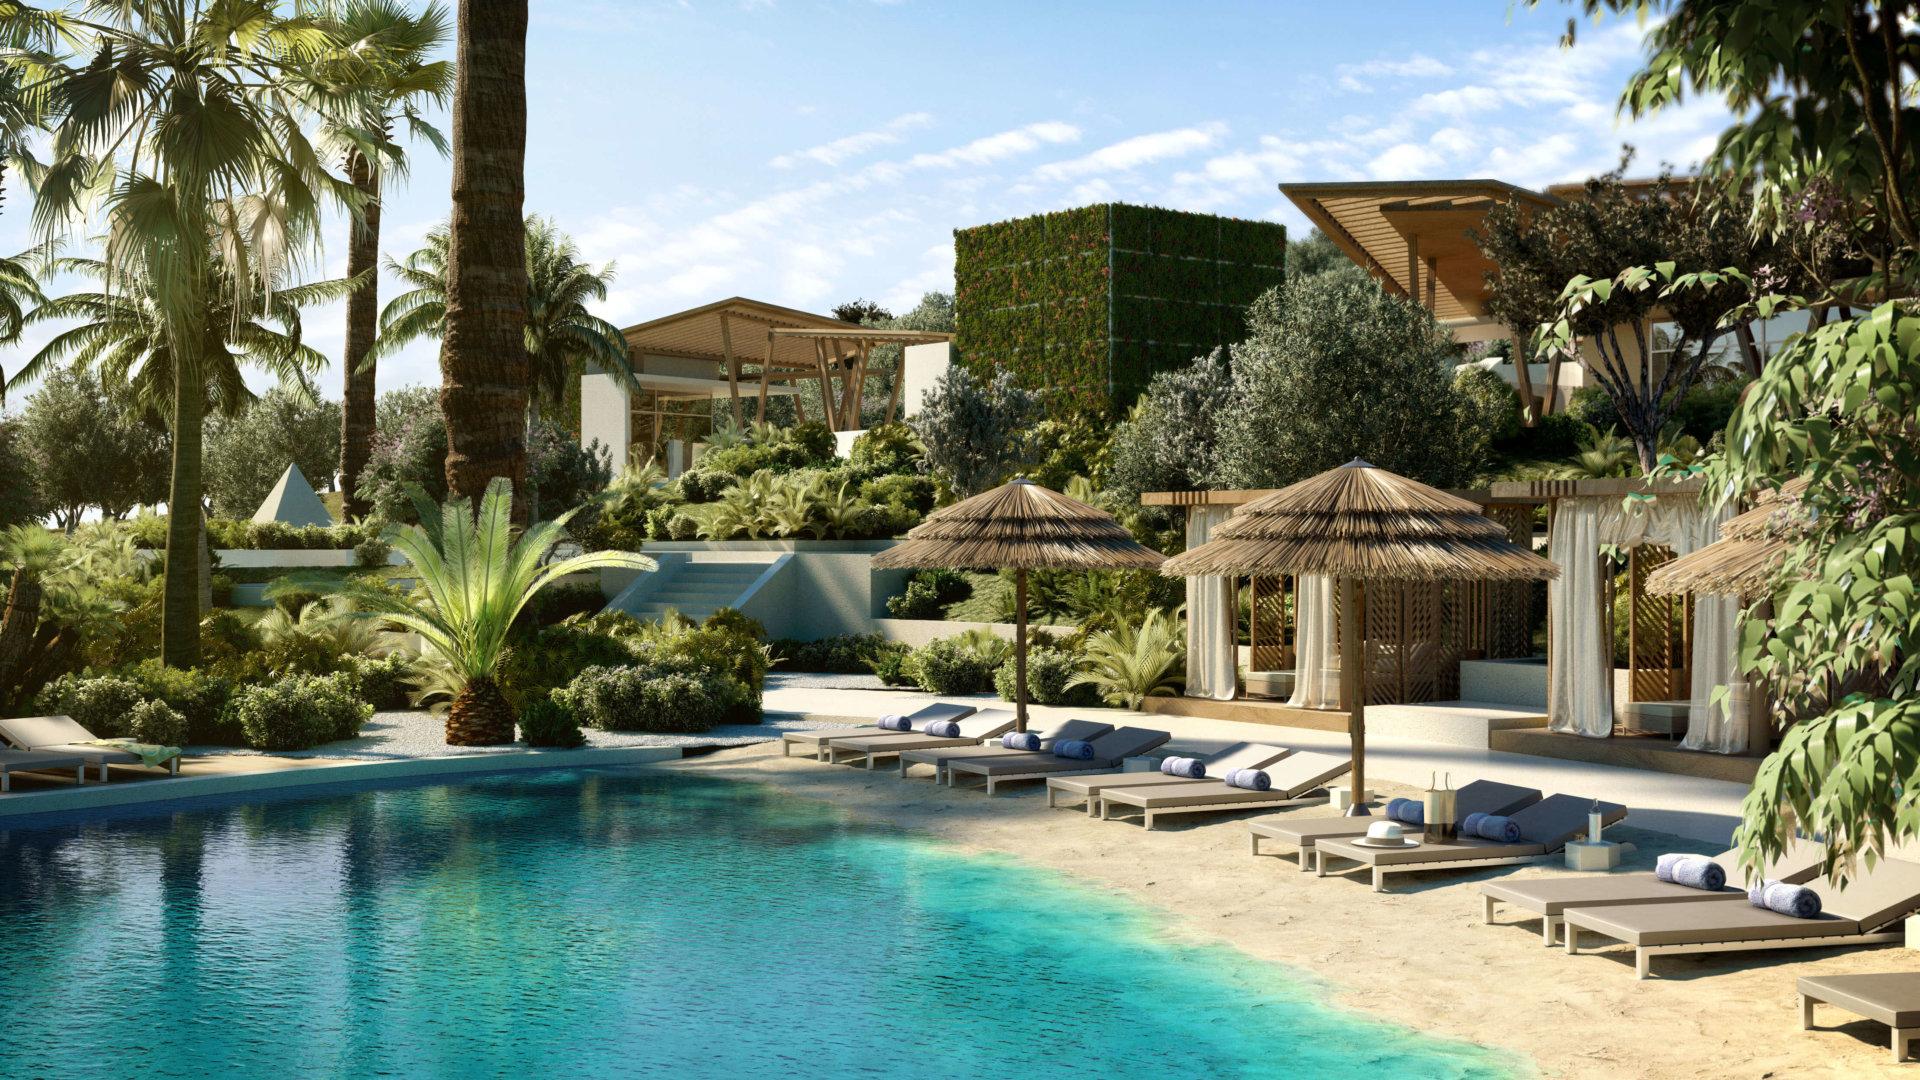 Sotogrande Announces Amazing New Facilities to Exclusive La Reserva Community